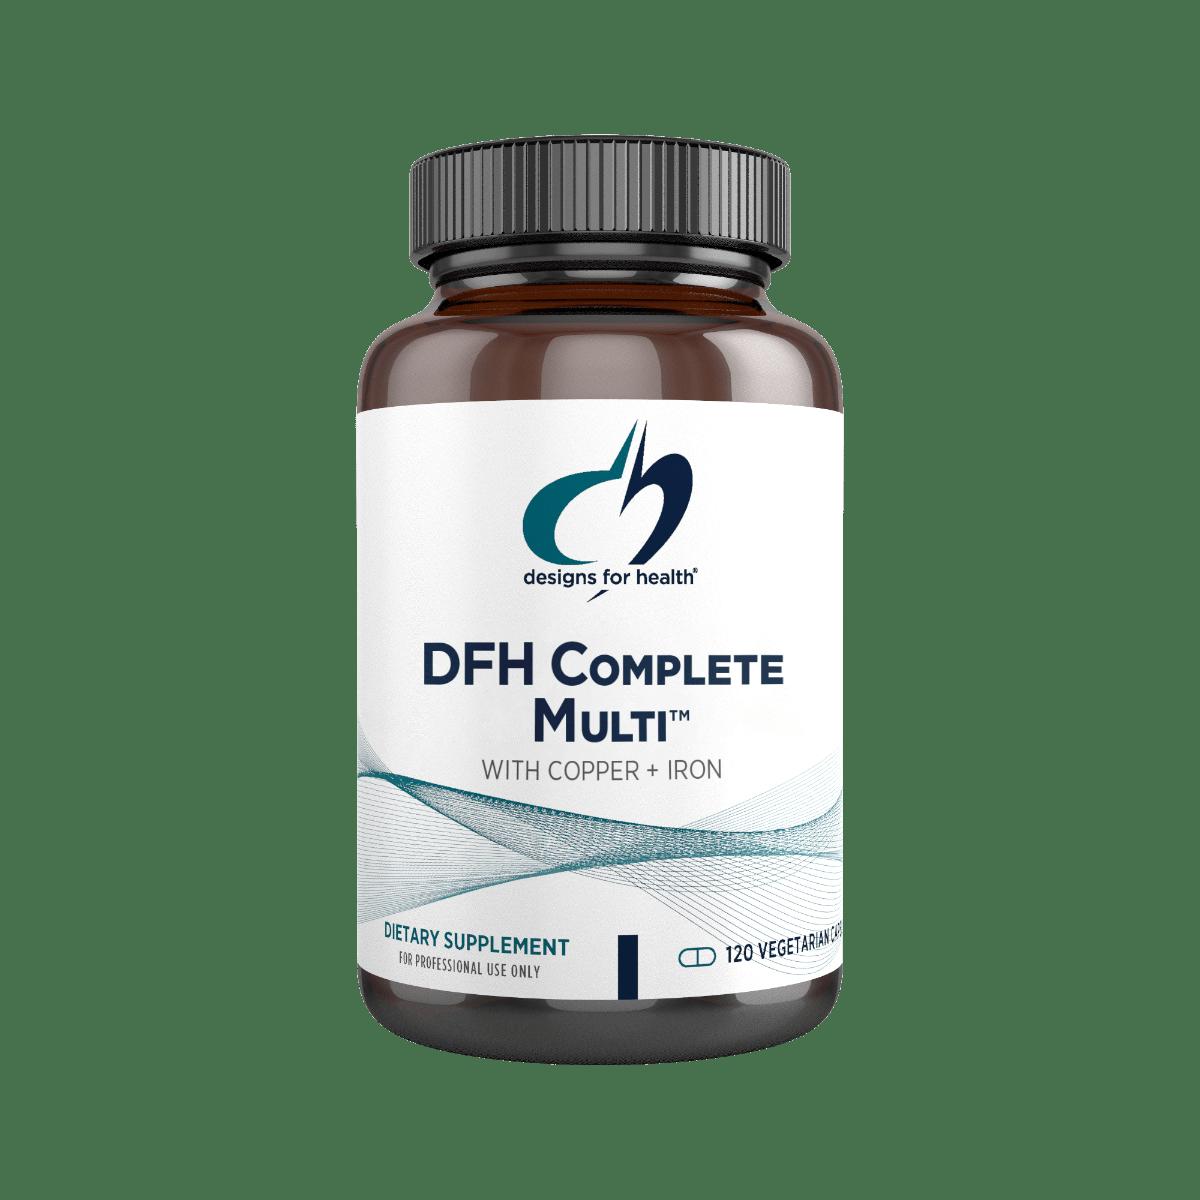 DFH Complete Multi (with Copper + Iron) 120 Designs for Health